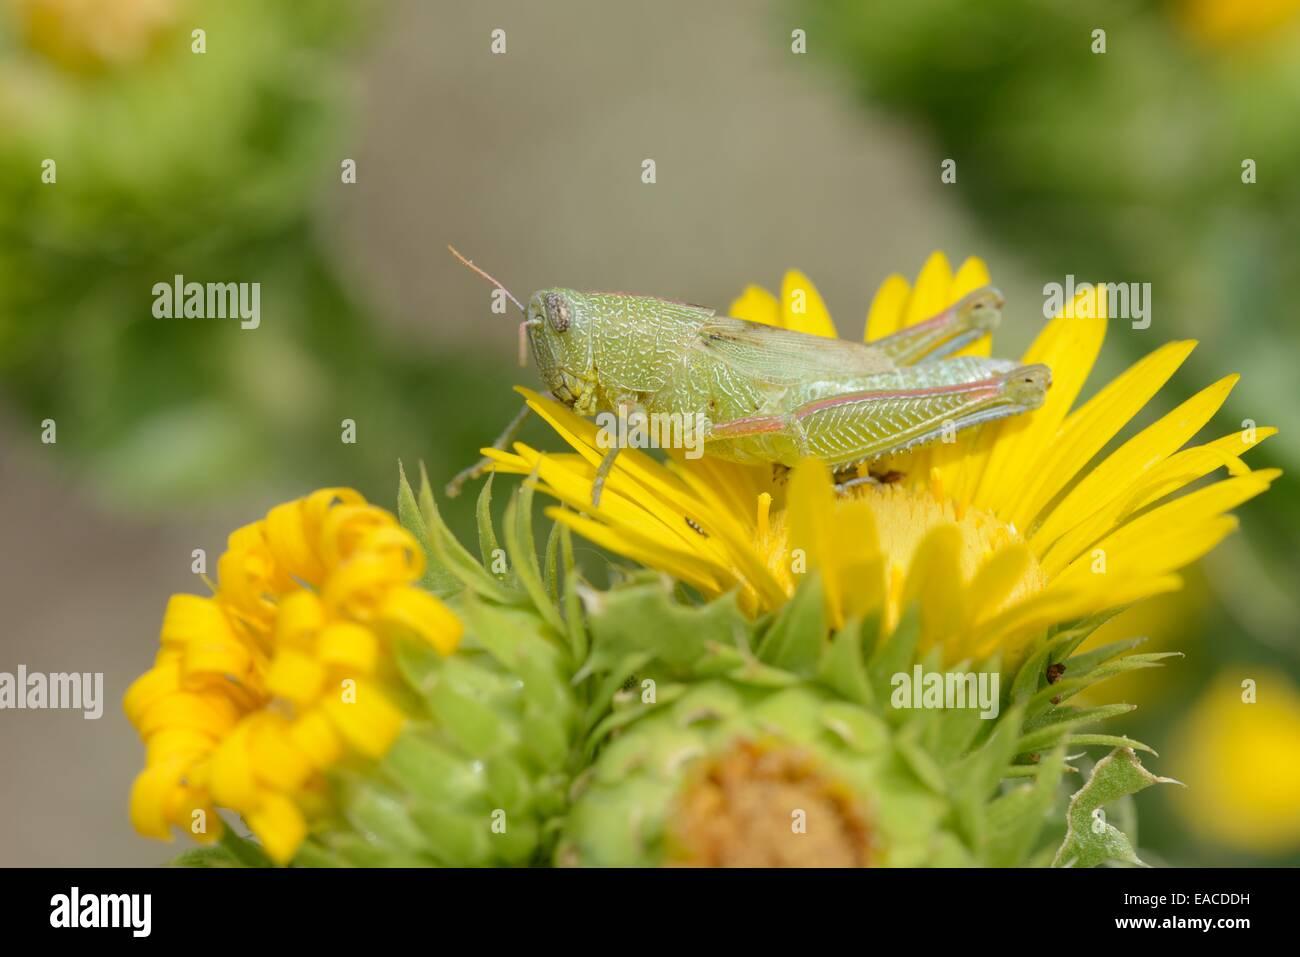 Showy Grasshopper on Saw-Leaf Daisy - Stock Image